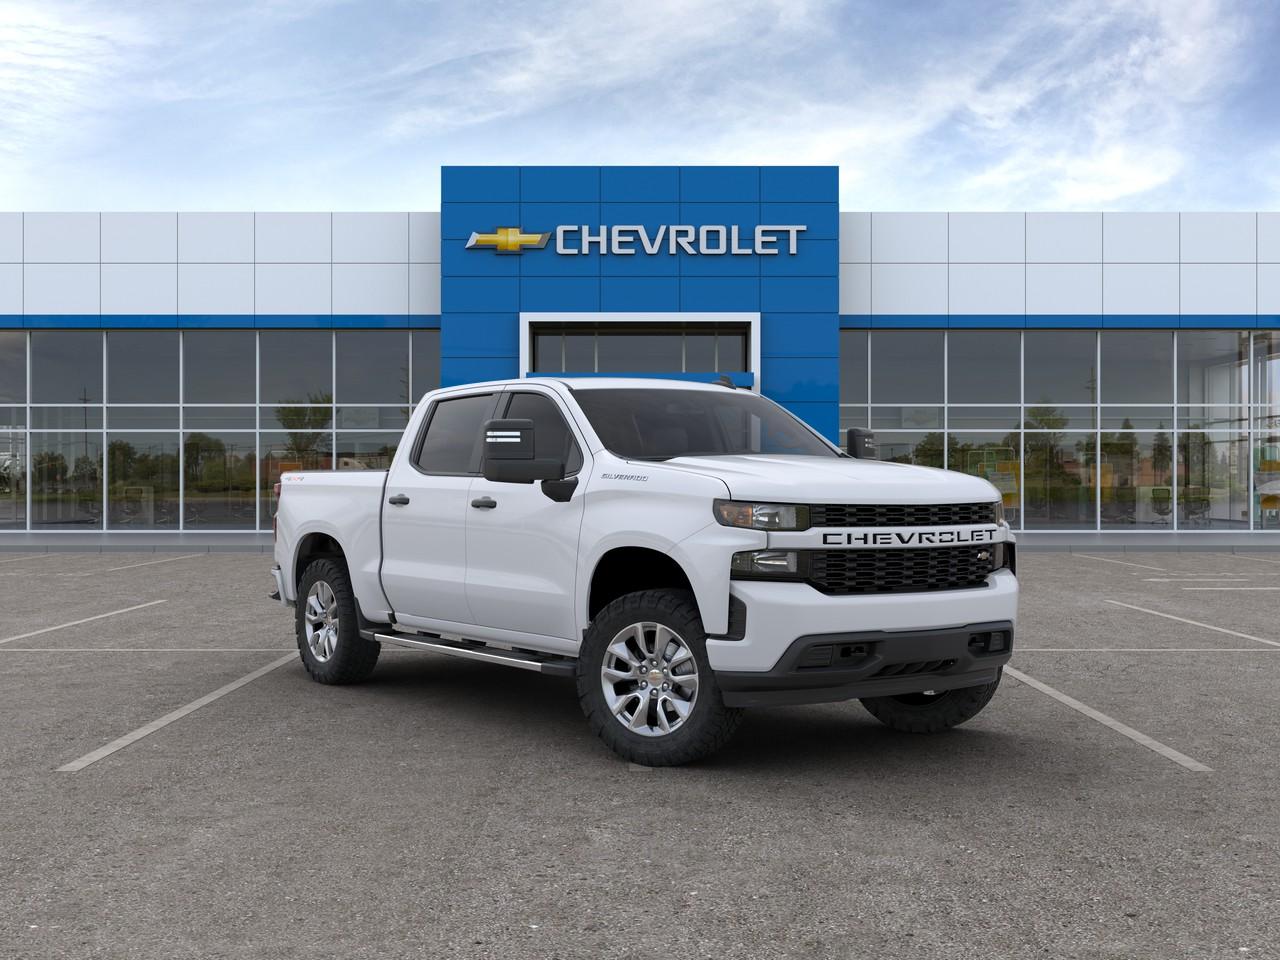 2020 Chevrolet Silverado 1500 Custom Crew Cab Pickup